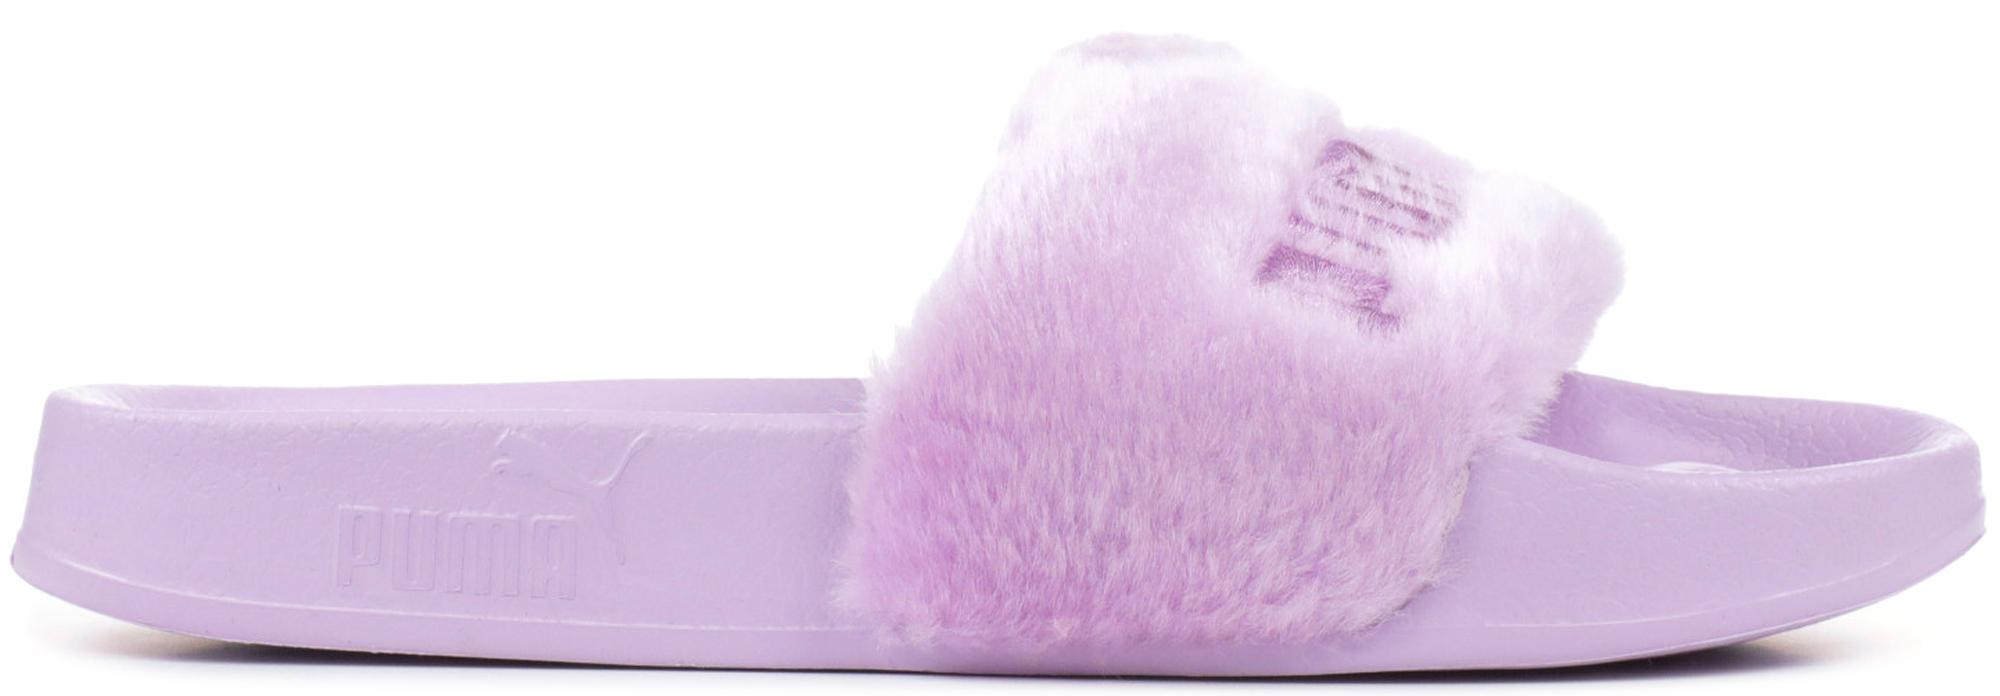 puma fenty slides price